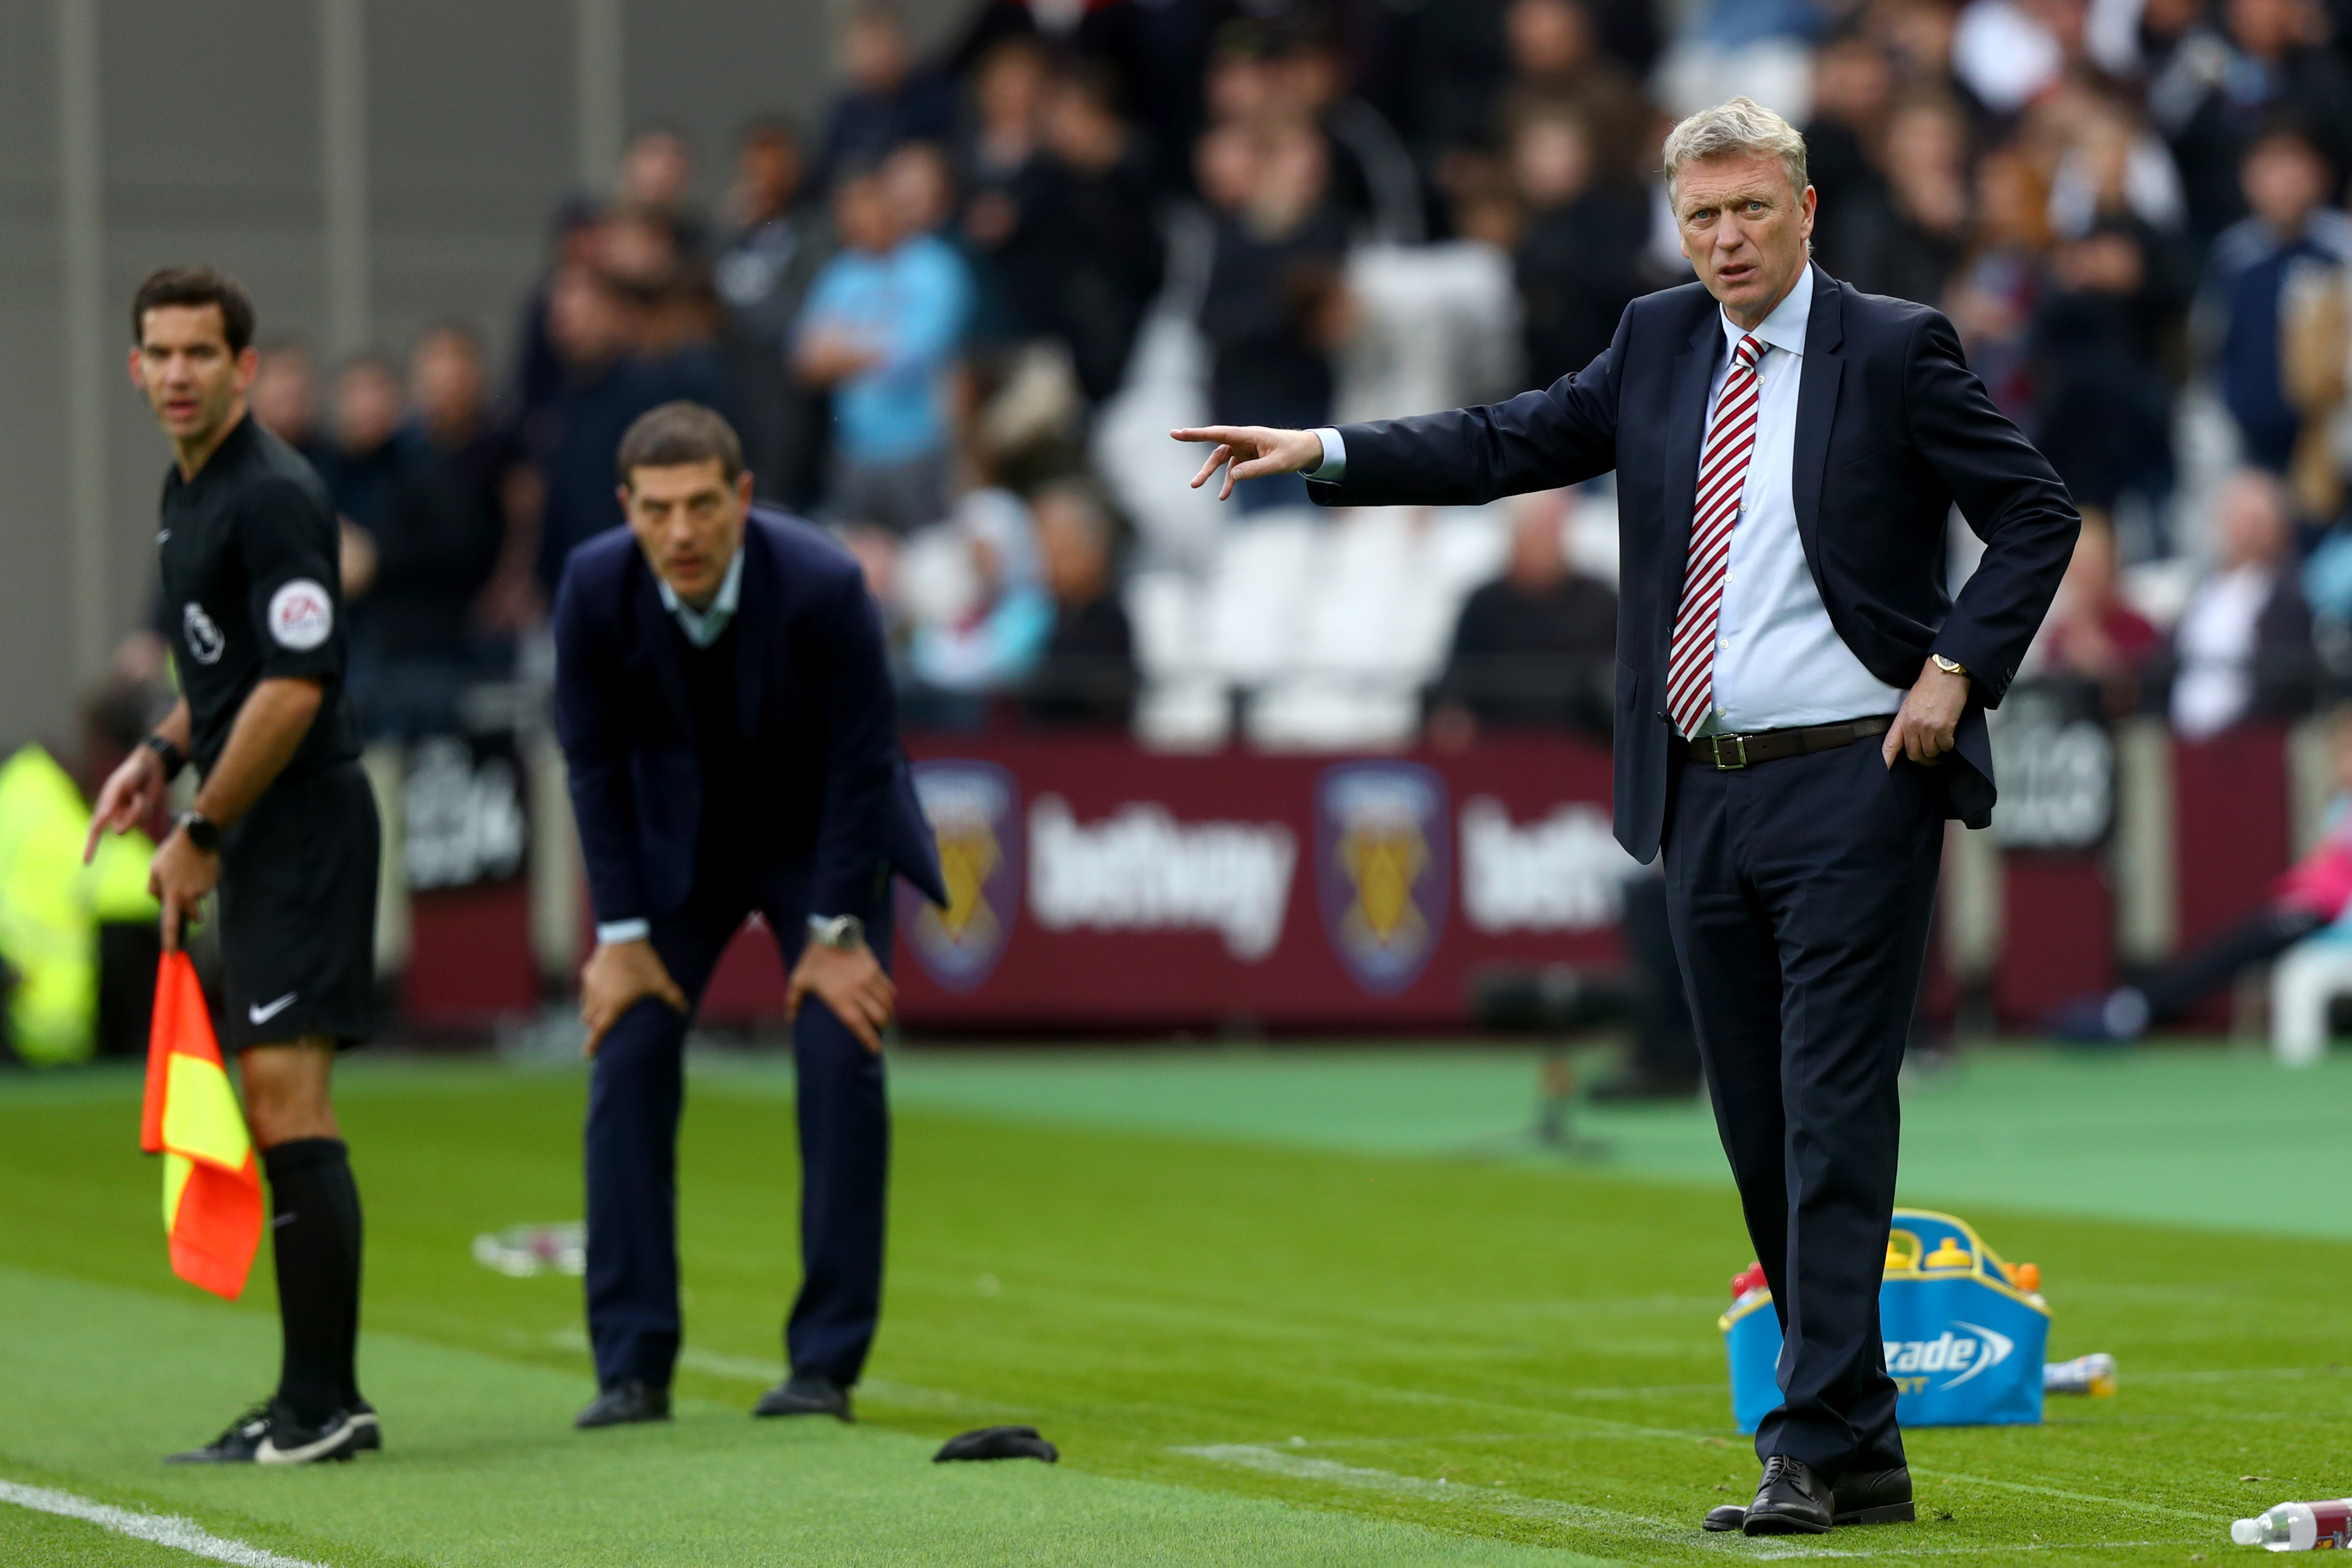 Breaking: David Moyes to remain Sunderland Manager next season